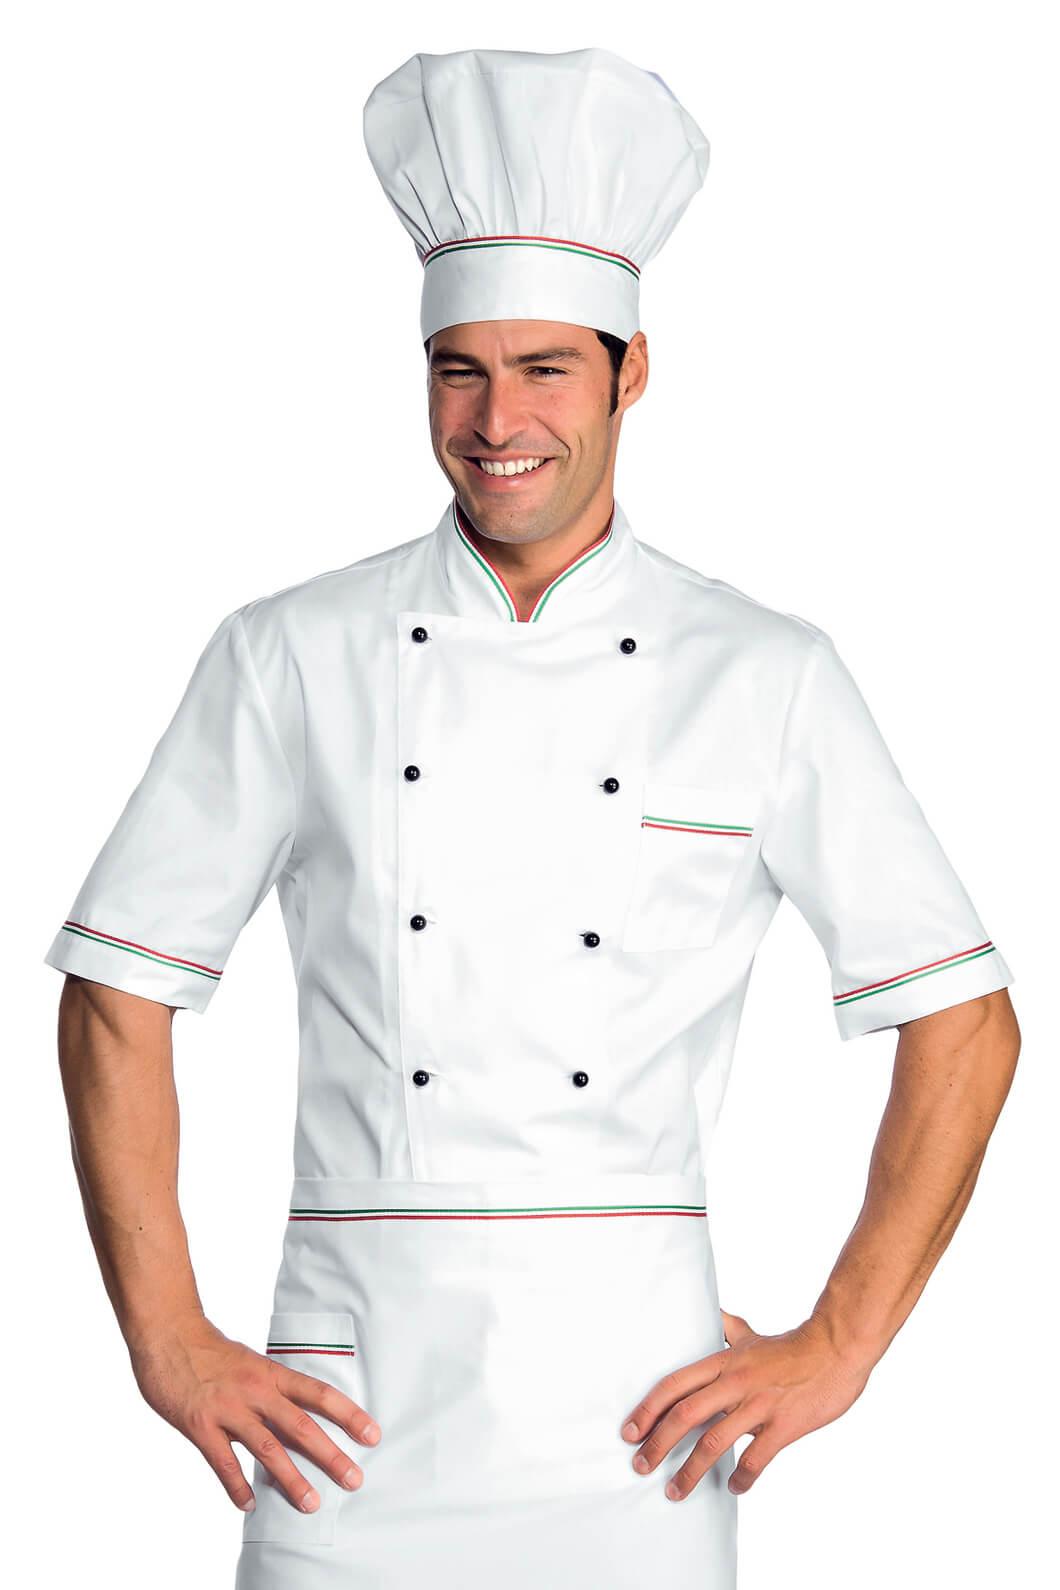 Veste chef cuisinier alicante blanc tricolore 100 coton for Cuisinier particulier